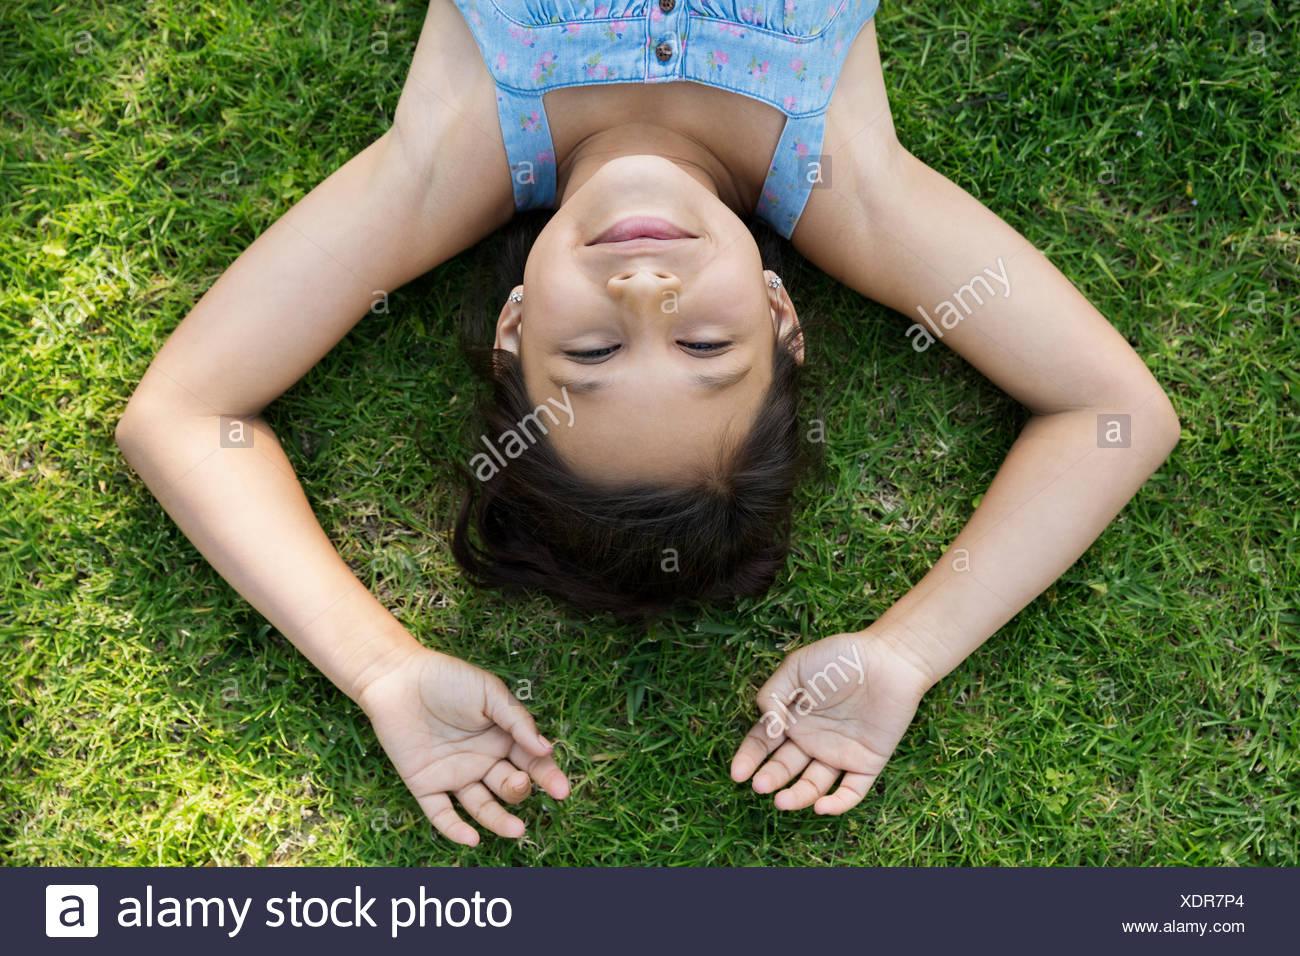 Obenliegende Porträt Brünette Mädchen Verlegung in Rasen Stockbild